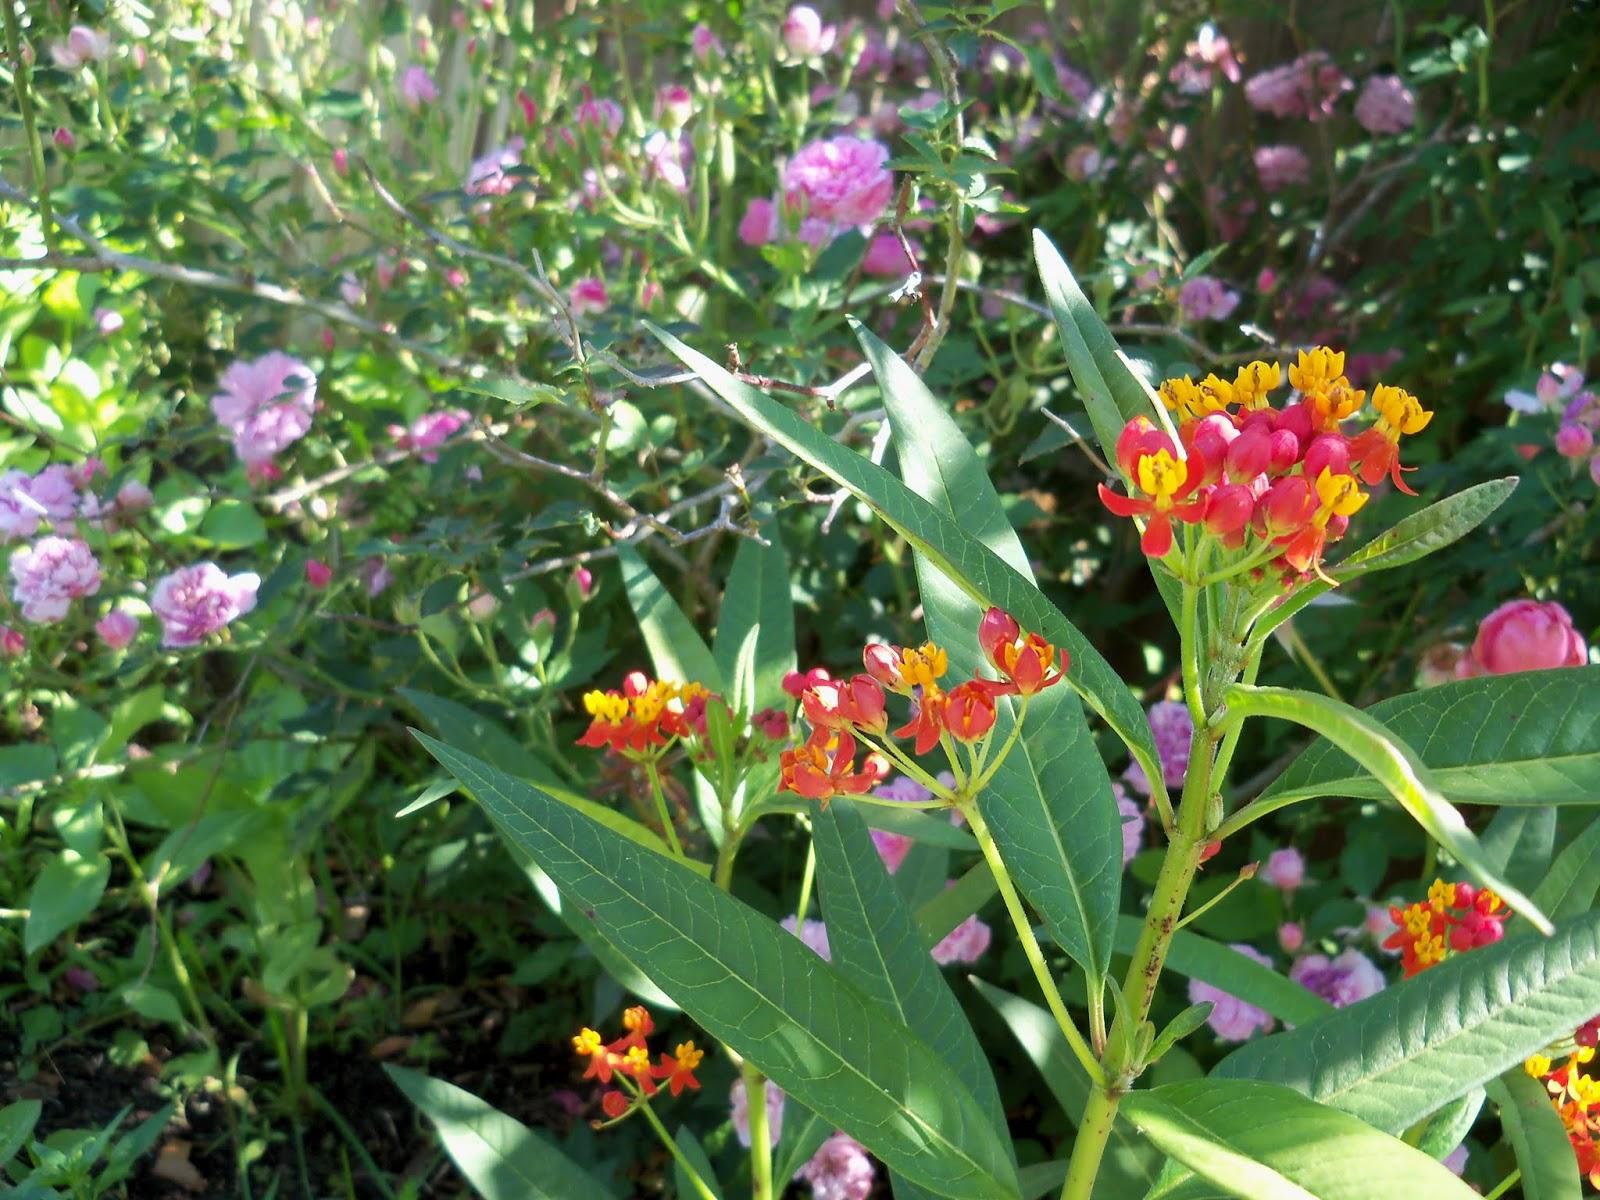 Gardening 2013 - 115_6228.JPG